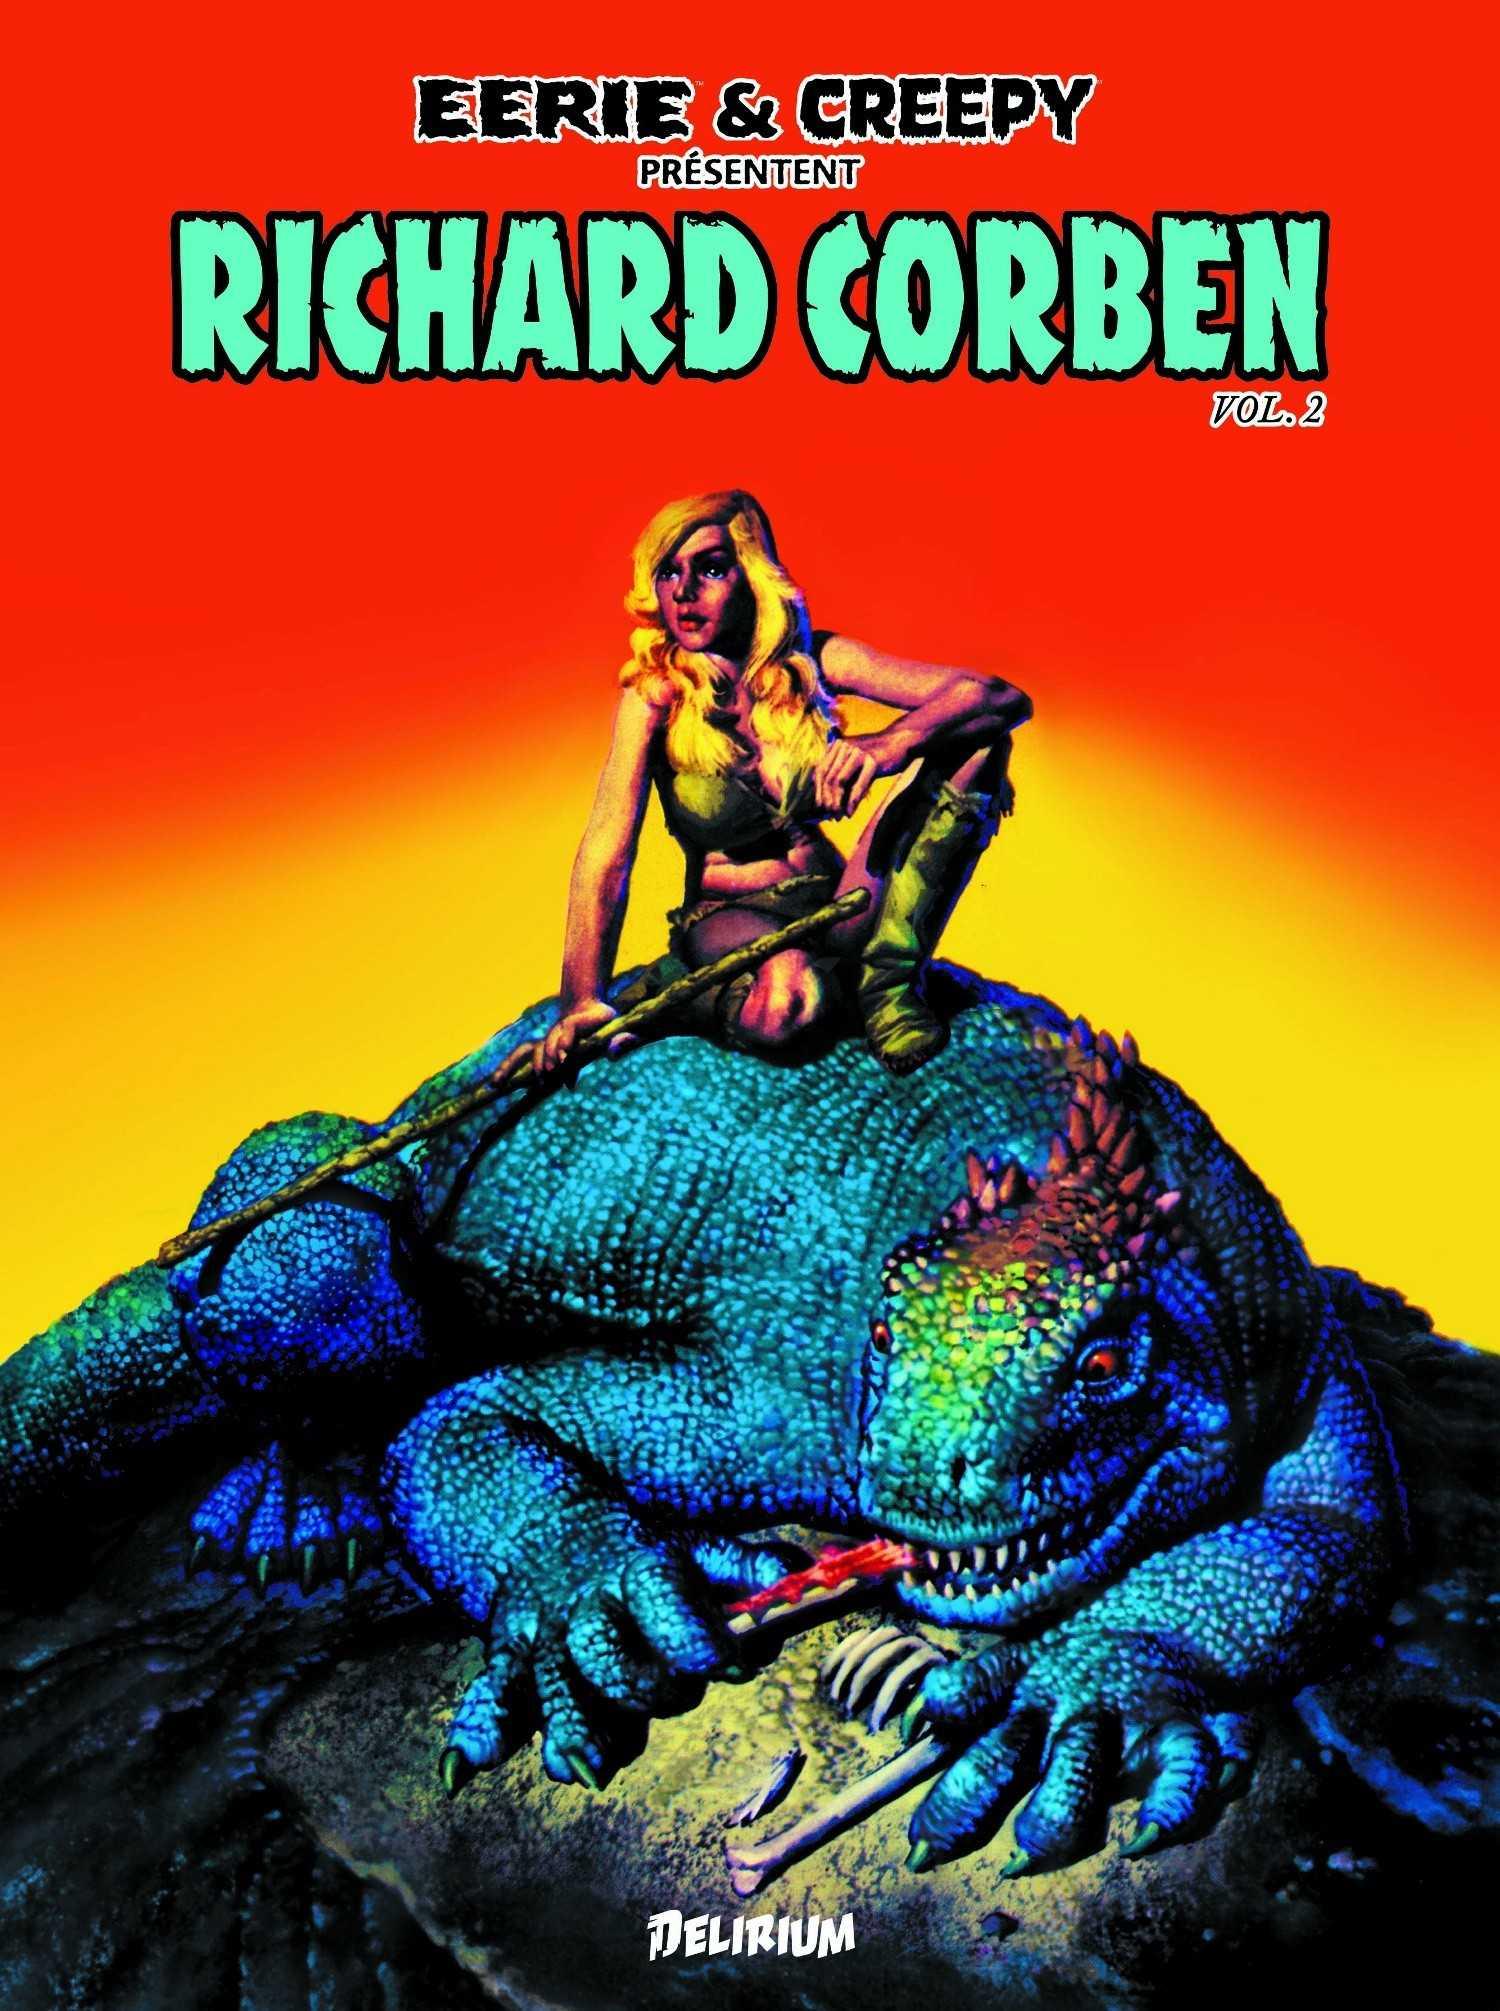 Richard Corben, frissons de plaisir angoissés avec Eerie & Creepy